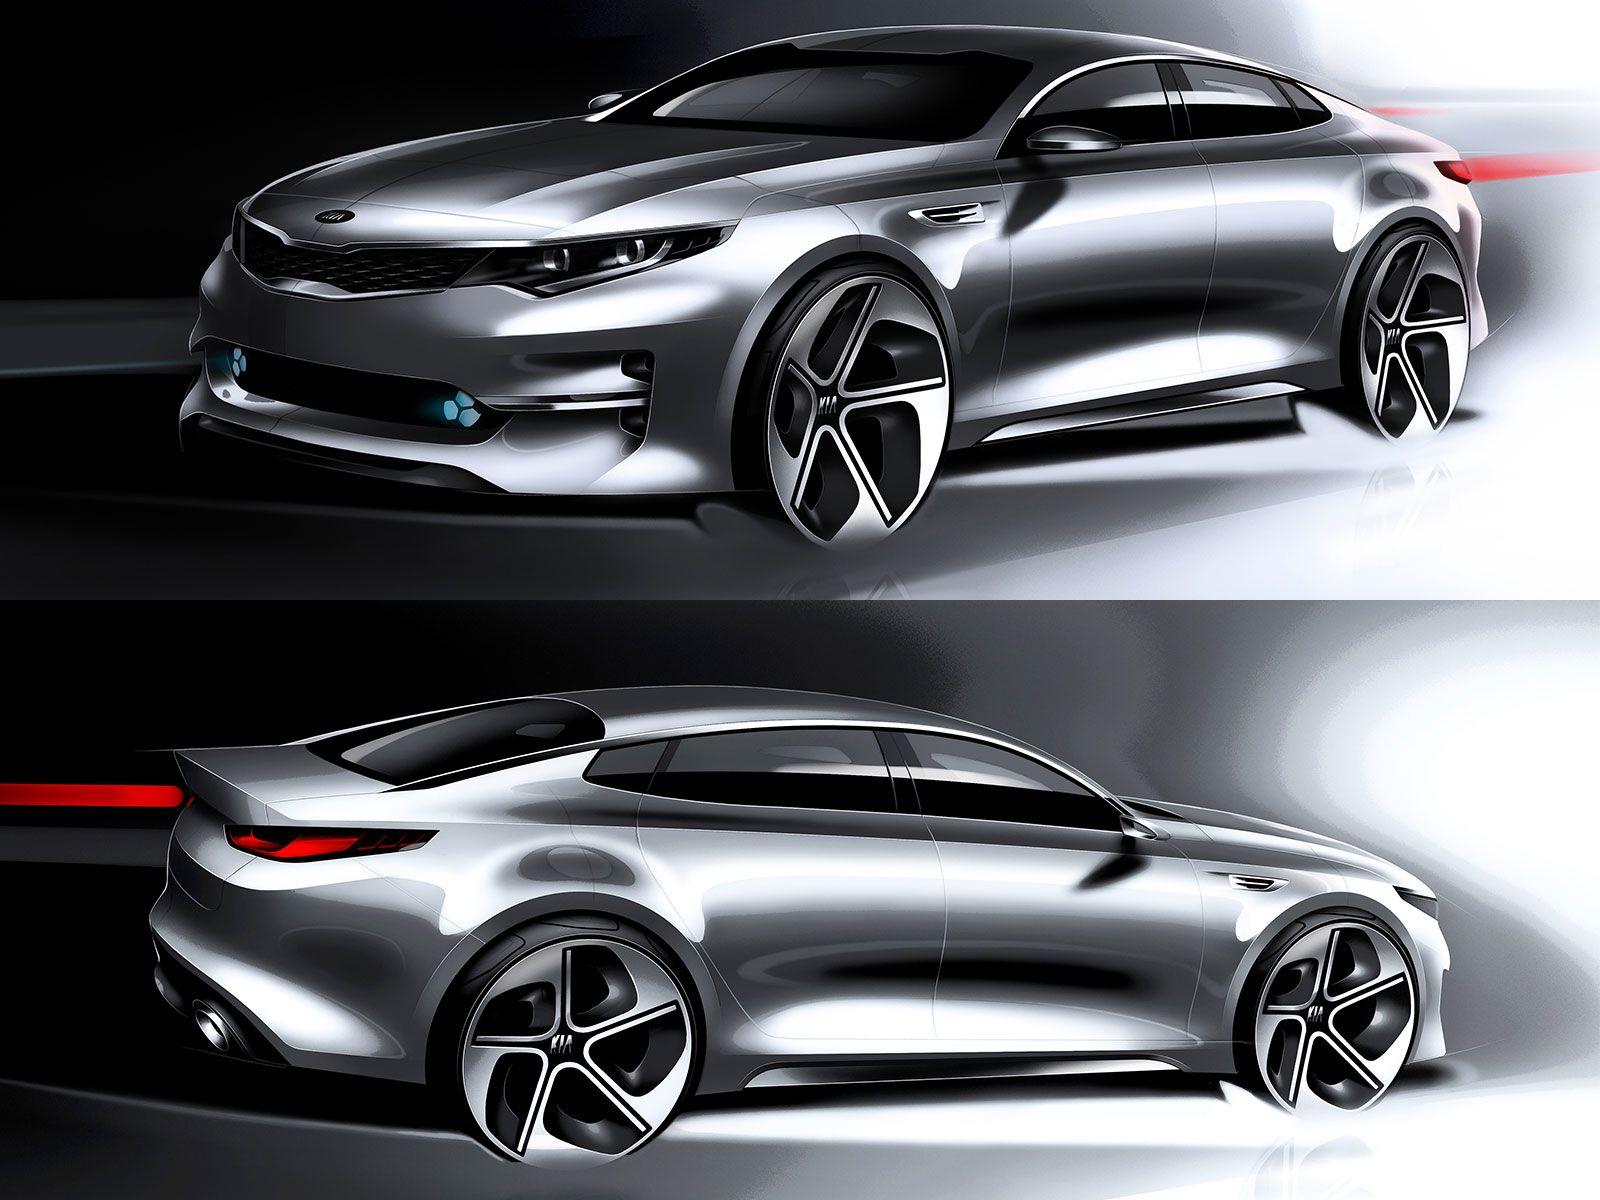 Kia reveals design sketches of next-gen Optima  Car design